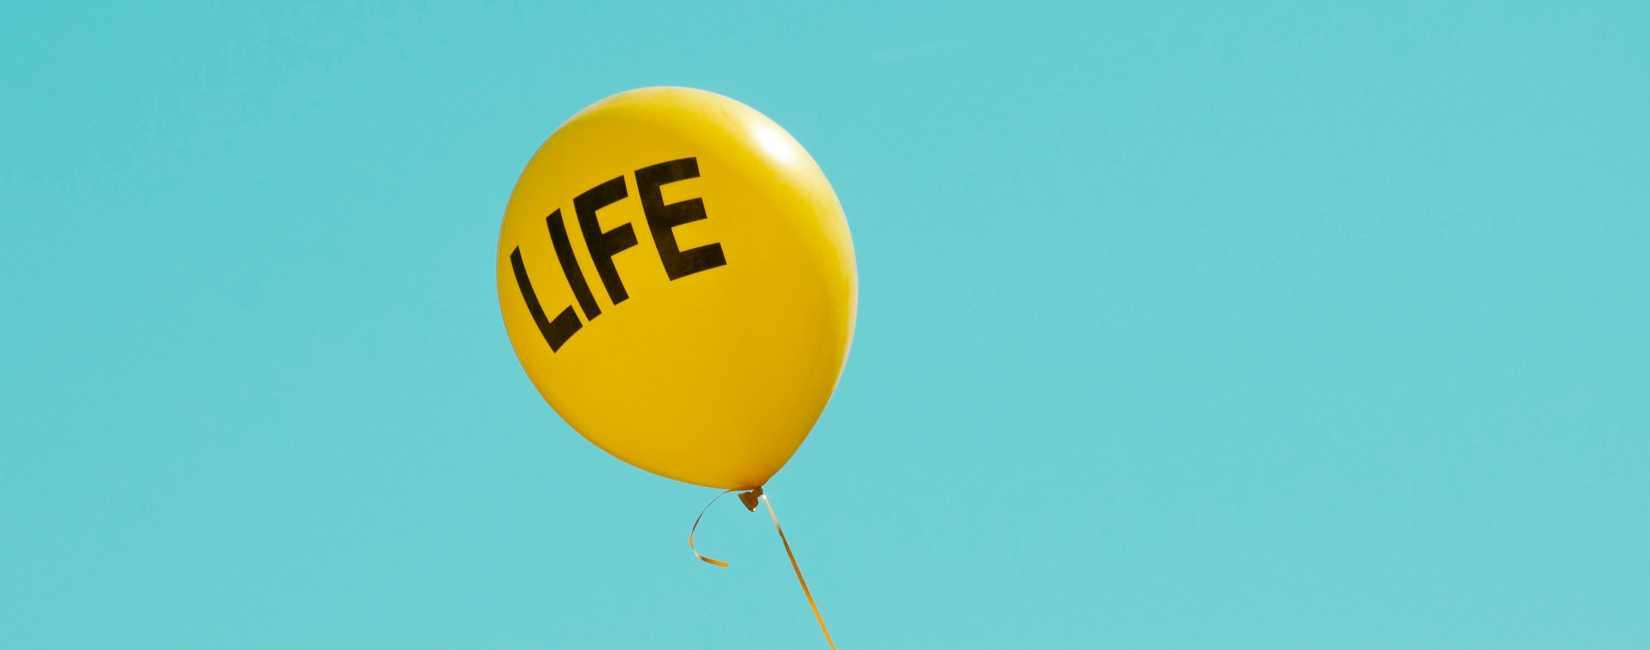 Life ballong